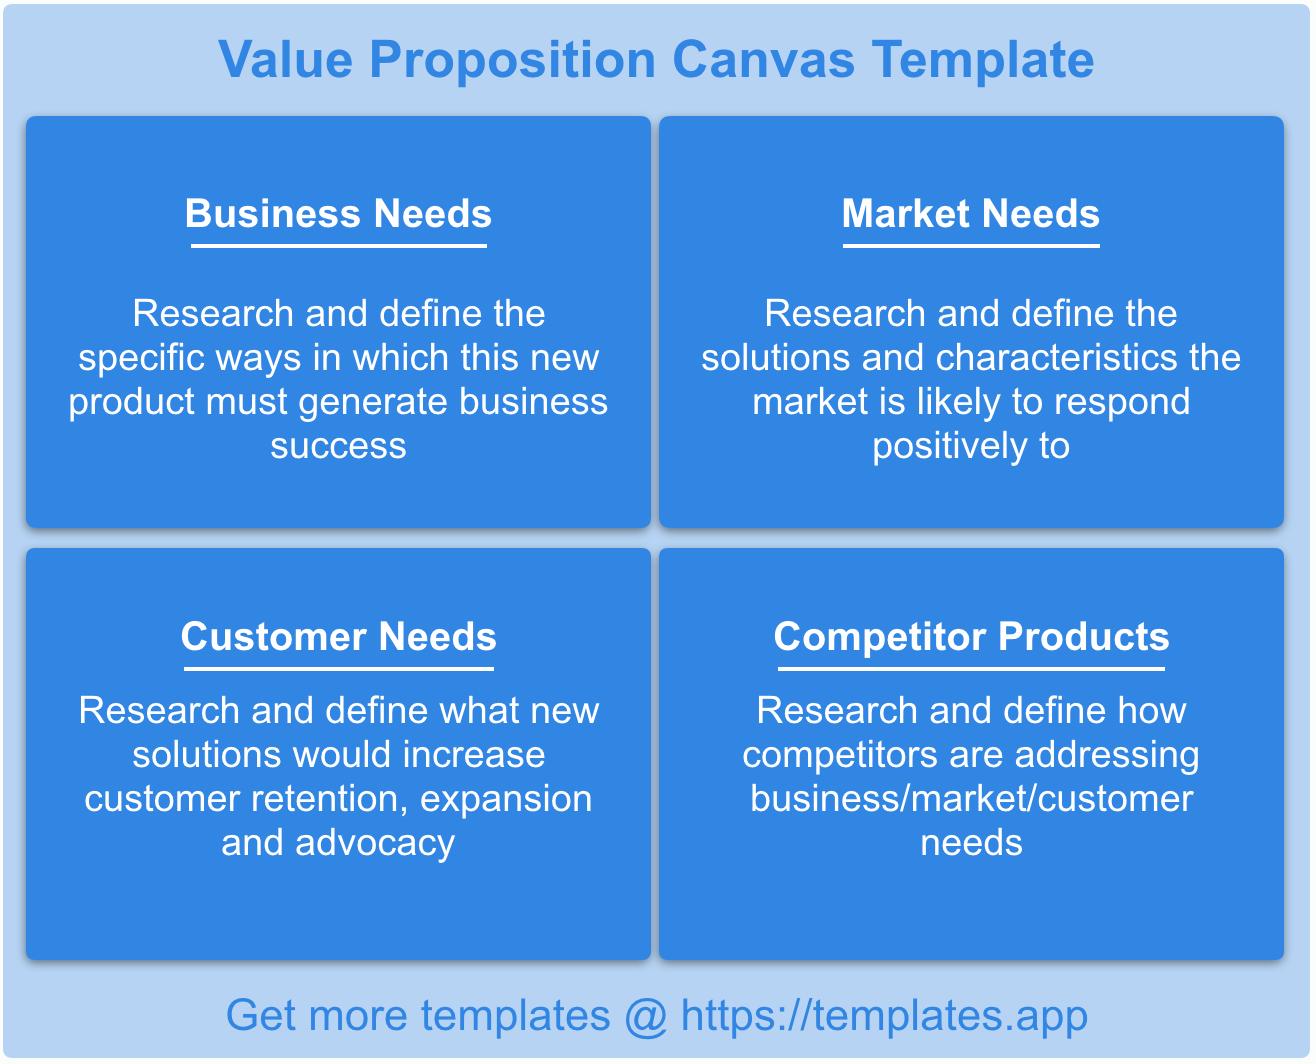 Value Prop Canvas TemplatesApp